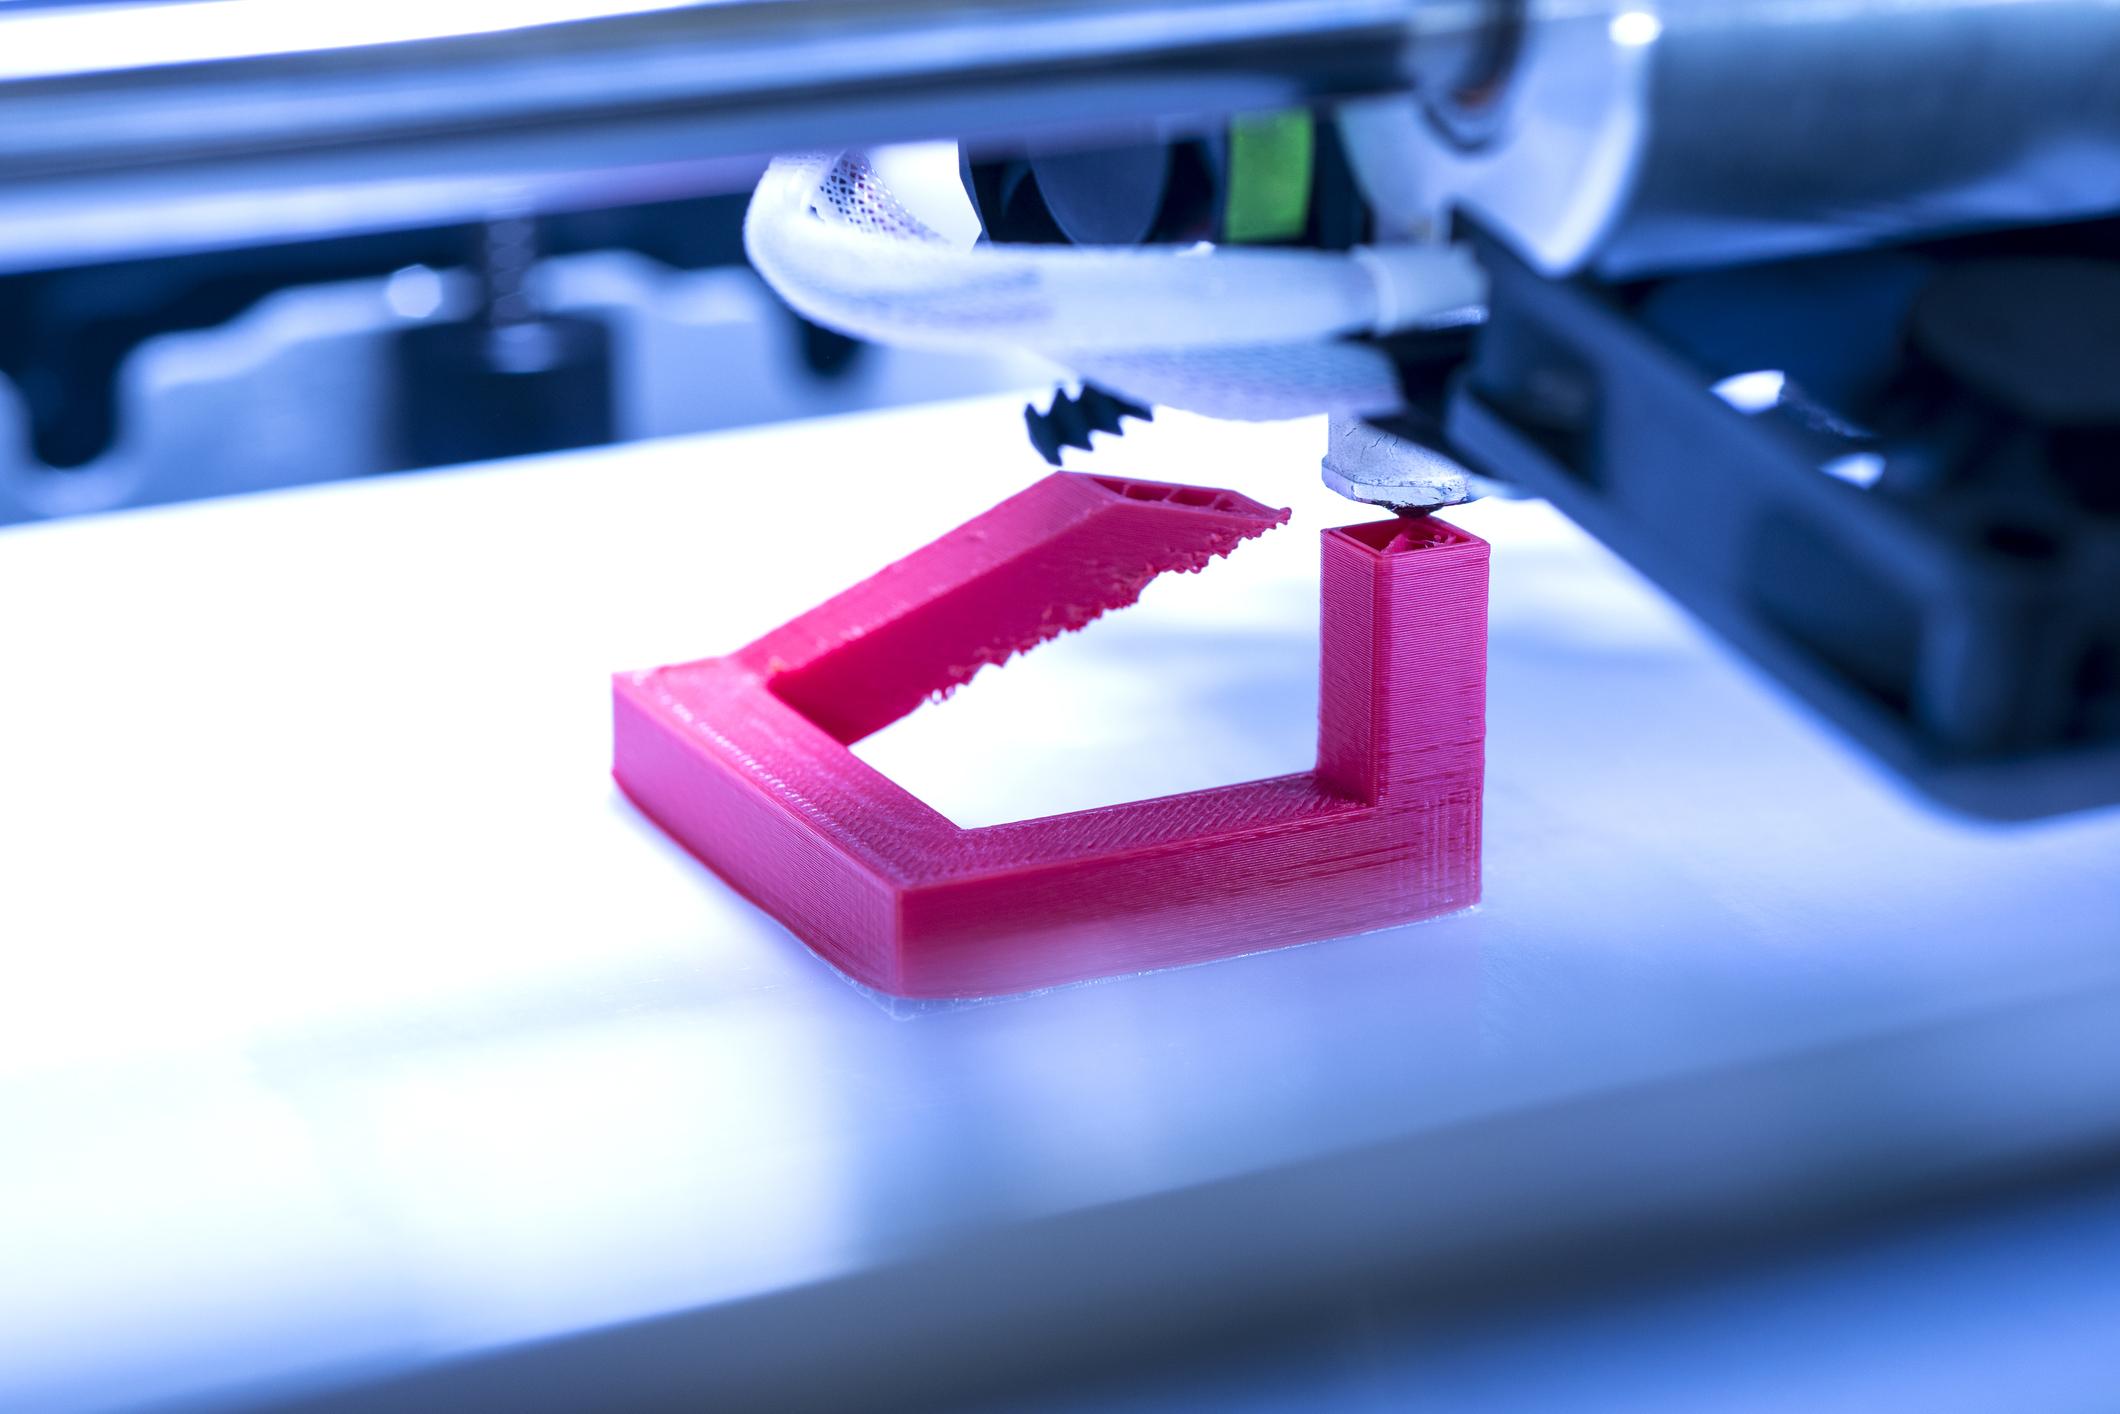 A 3D printer printing a magenta-colored part.